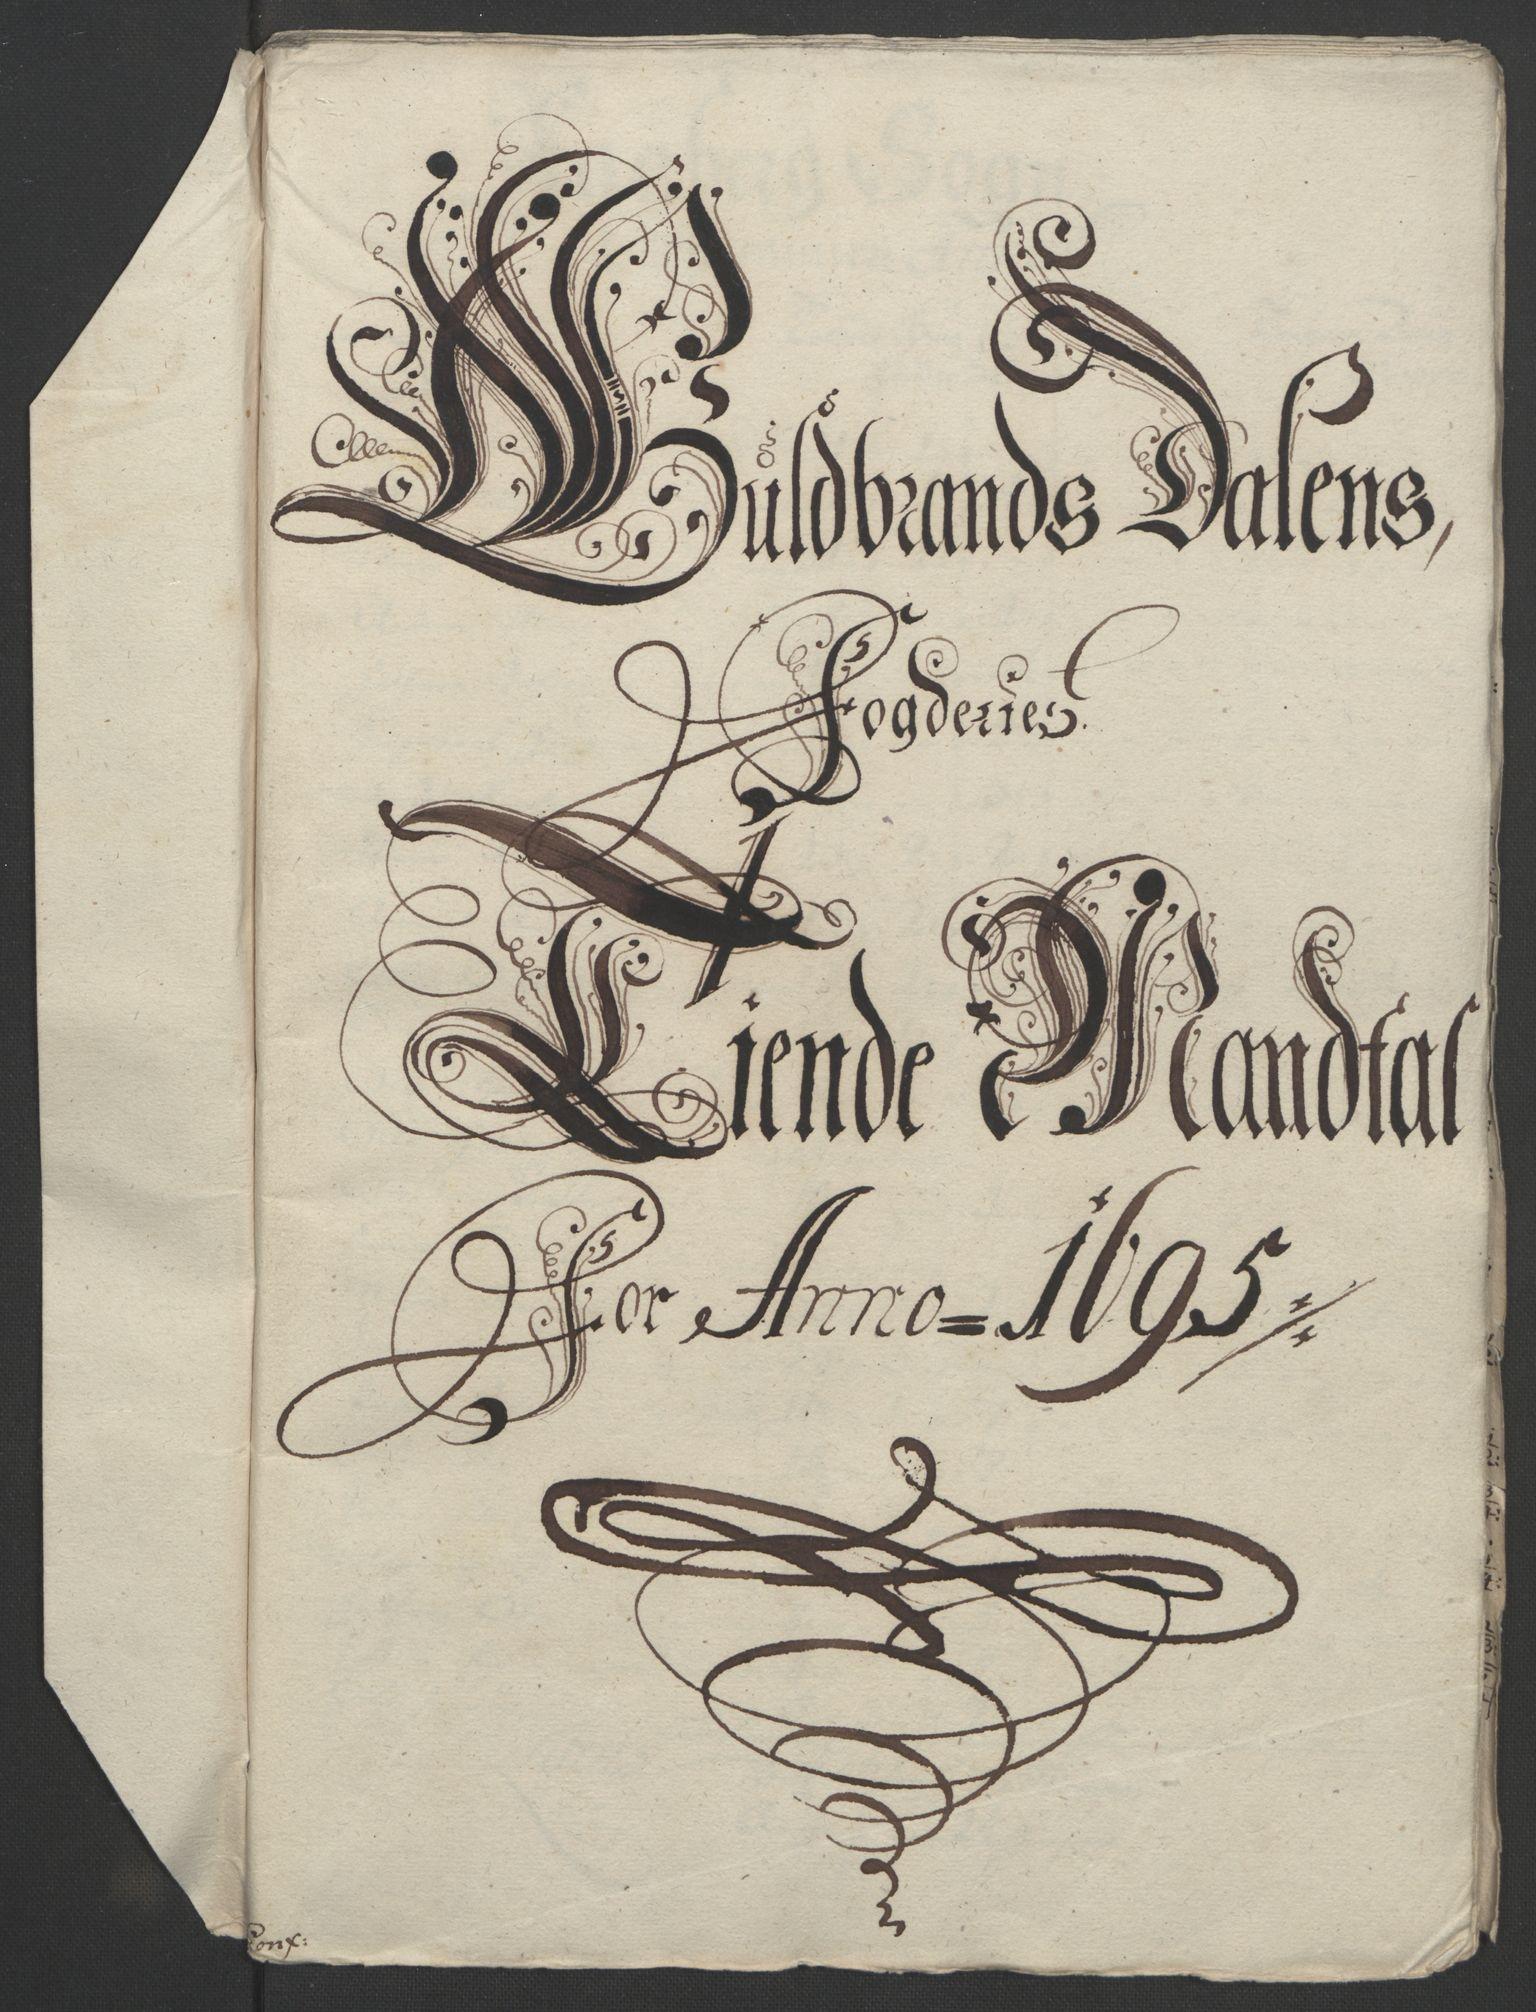 RA, Rentekammeret inntil 1814, Reviderte regnskaper, Fogderegnskap, R17/L1169: Fogderegnskap Gudbrandsdal, 1695, s. 62